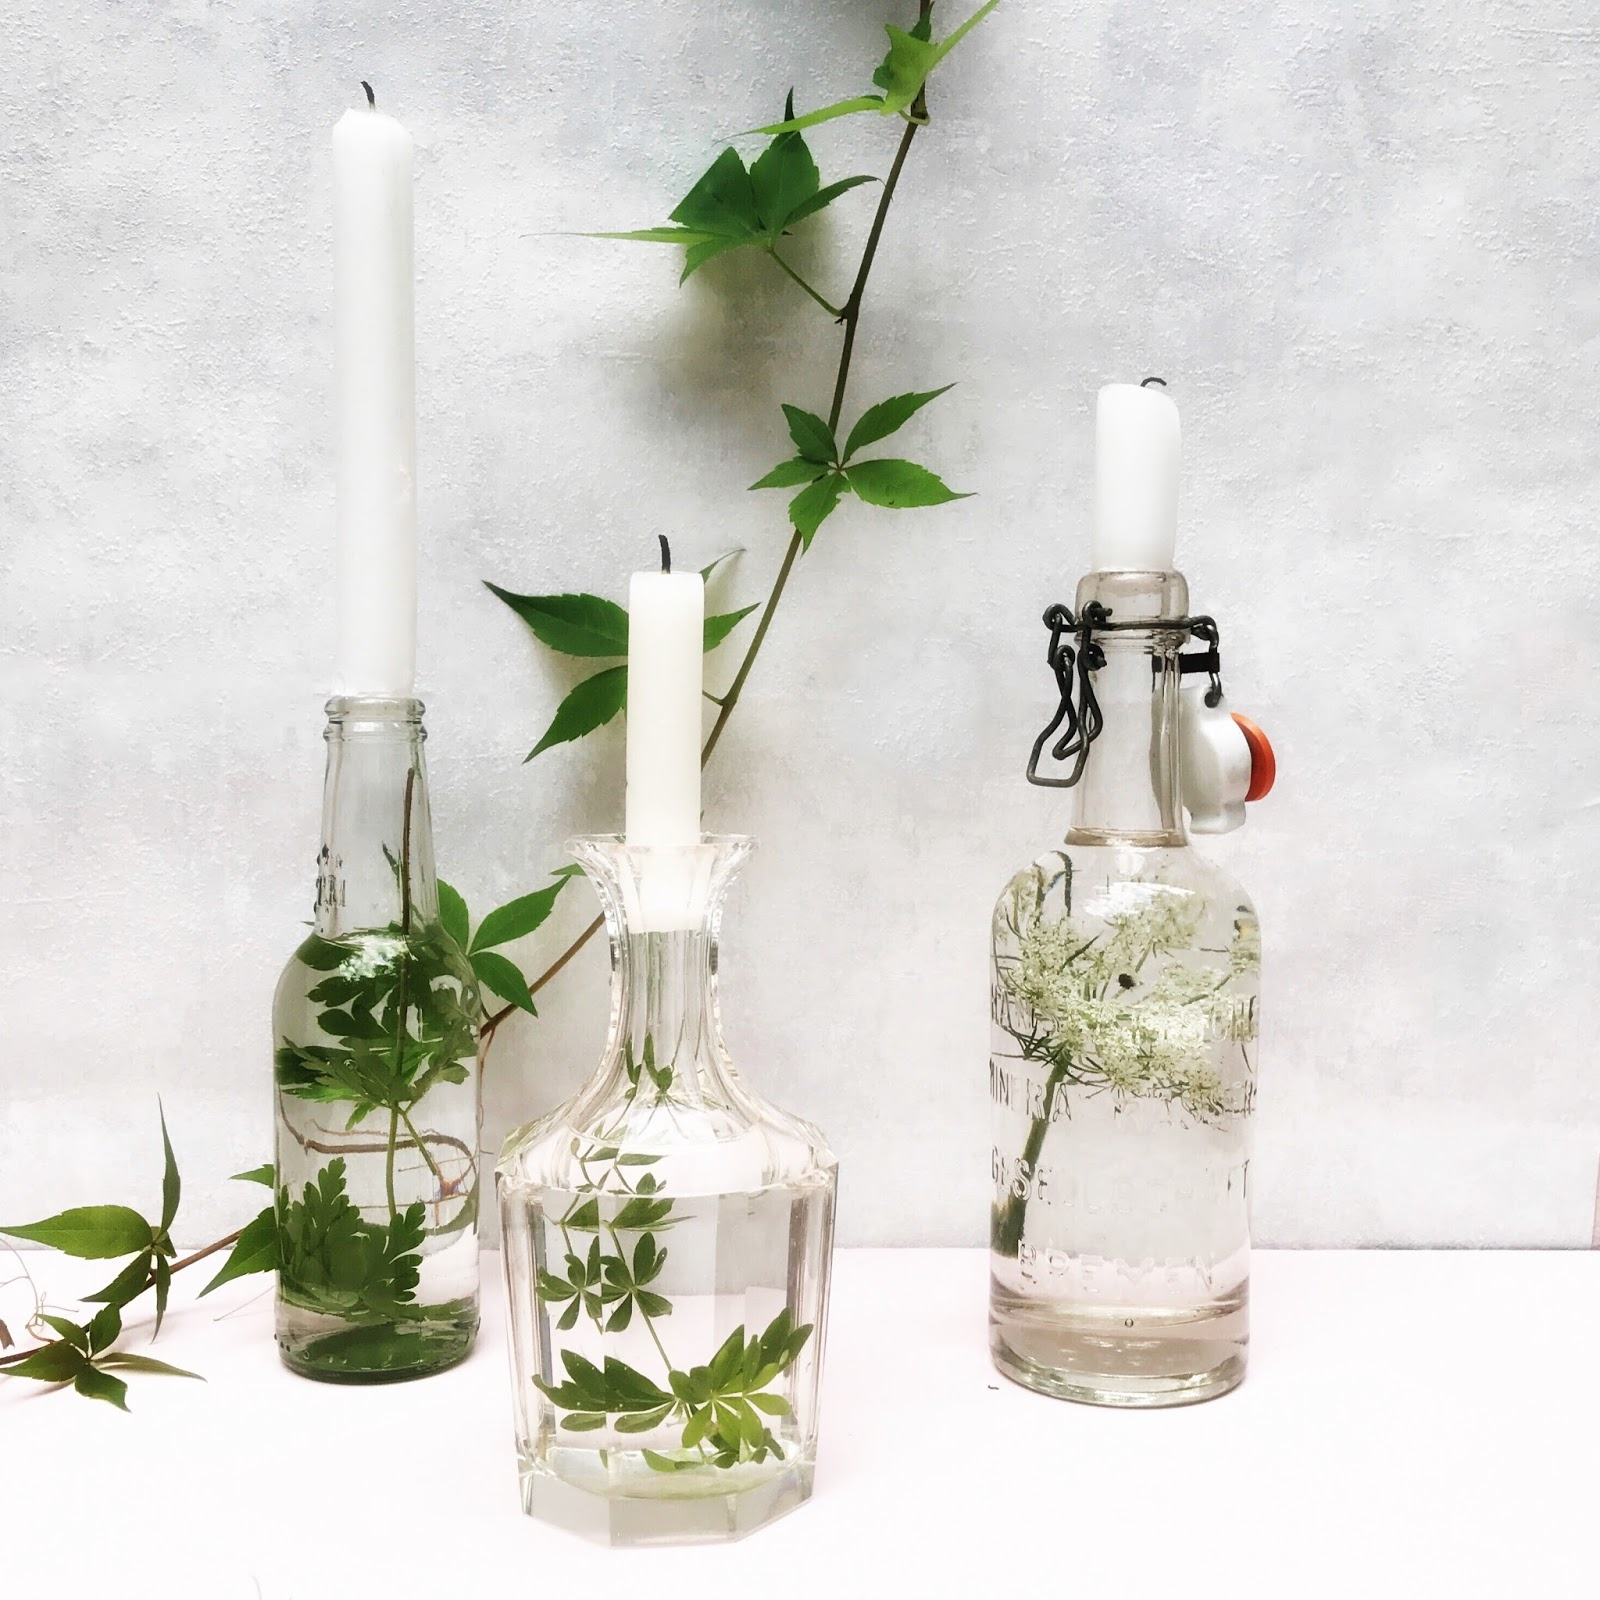 Neu Hohe Glasvase Dekorieren Ideen Ideen